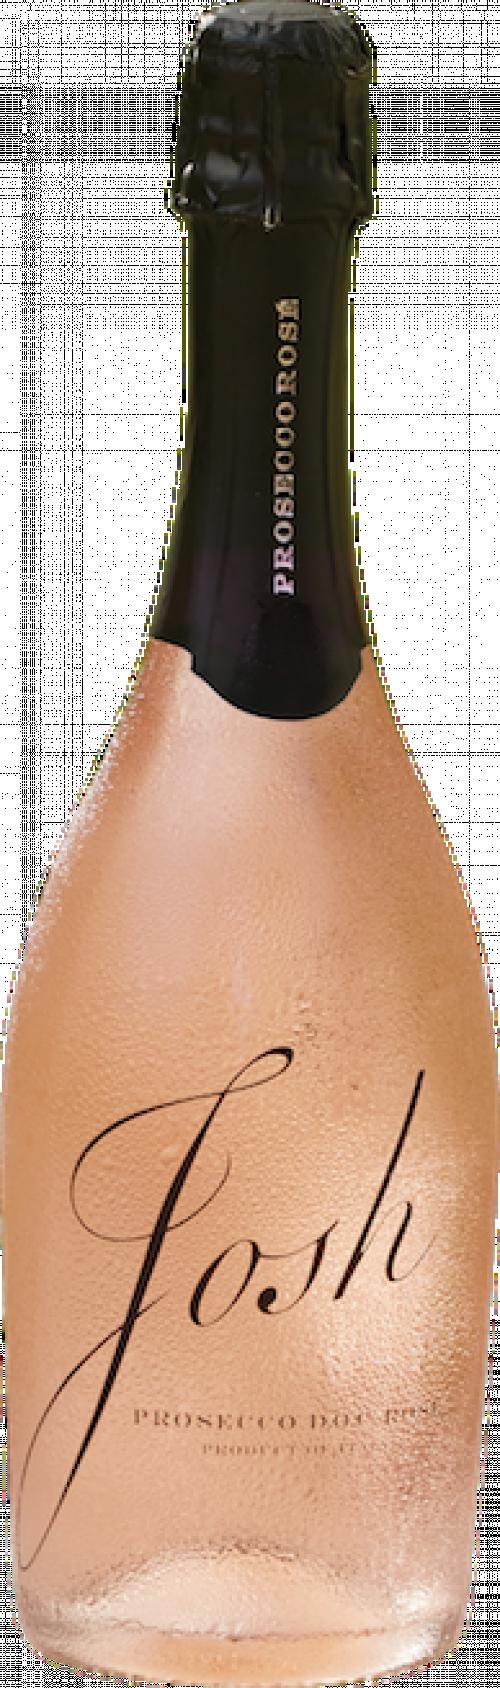 Josh Prosecco Rose Extra Dry 750ml NV